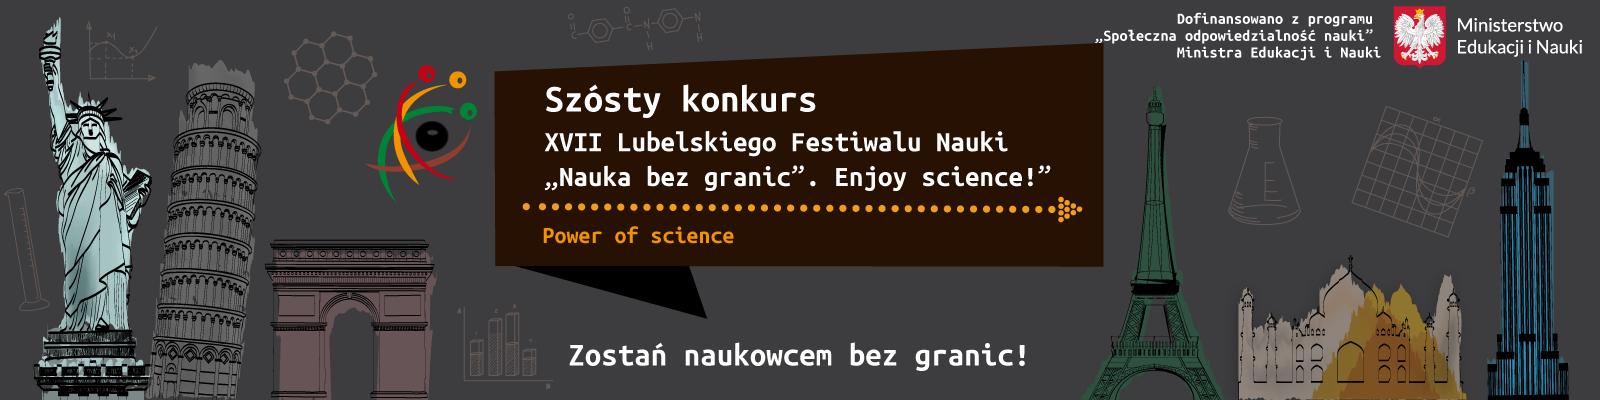 VI konkurs LFN - Power of science